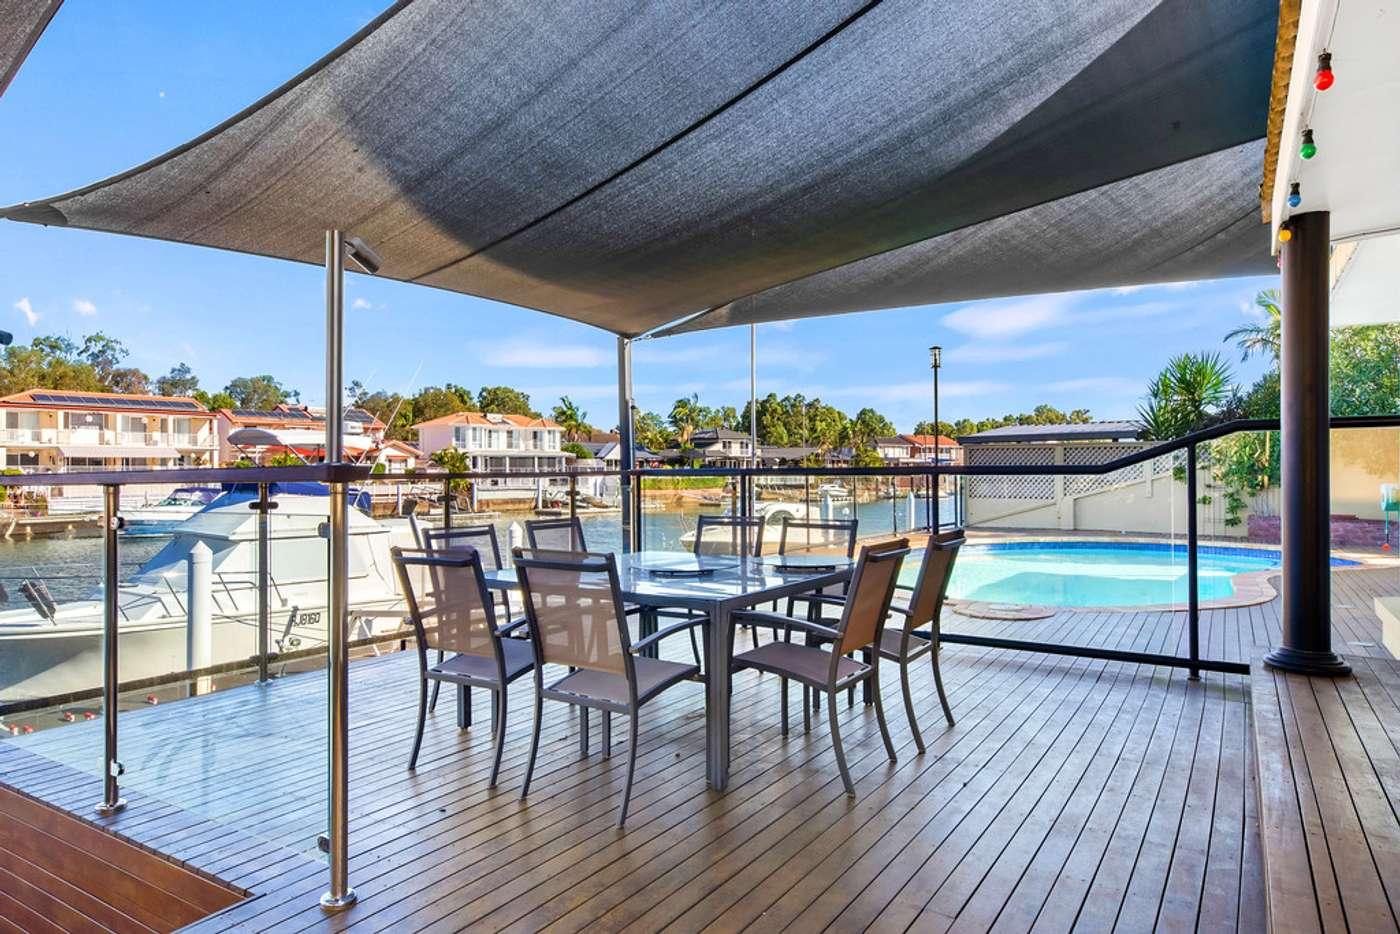 Main view of Homely house listing, 42 Sundance Way, Runaway Bay QLD 4216